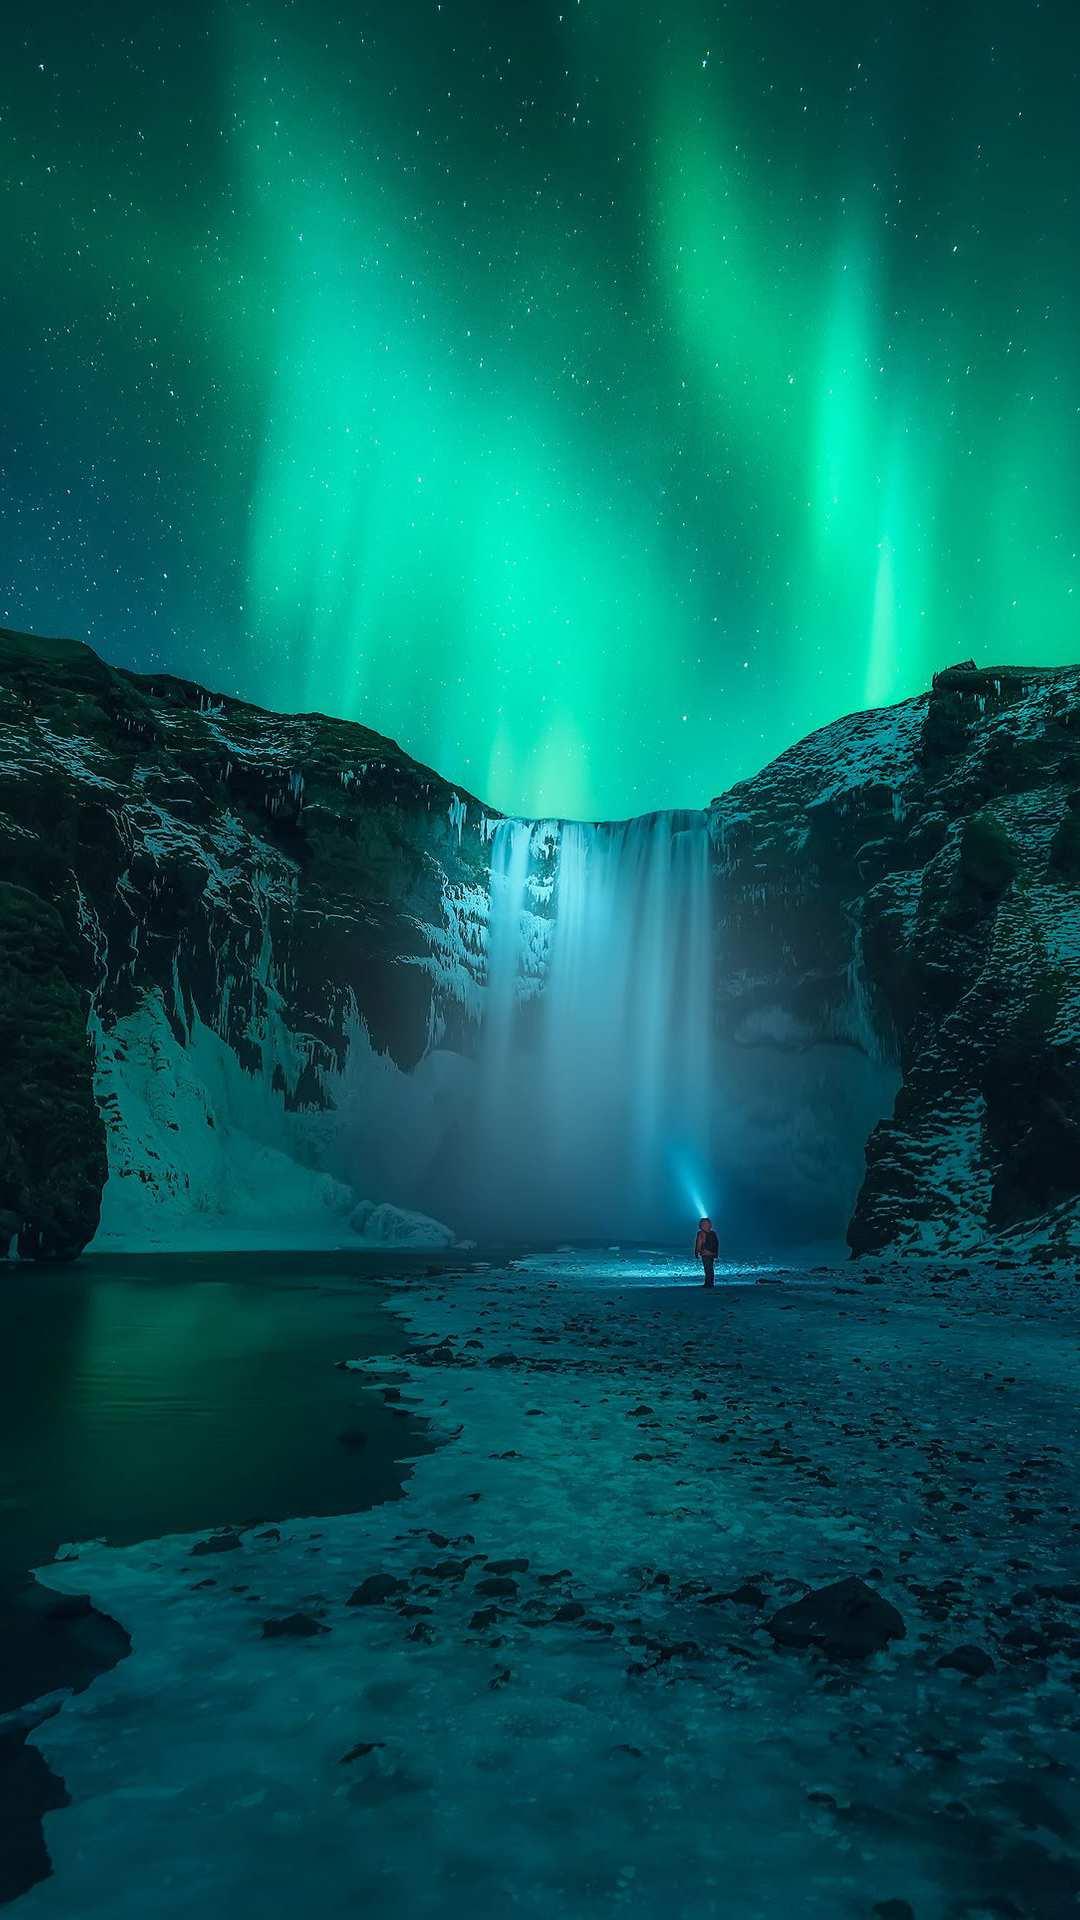 Iceland Waterfall Aurora in Sky iPhone Wallpaper